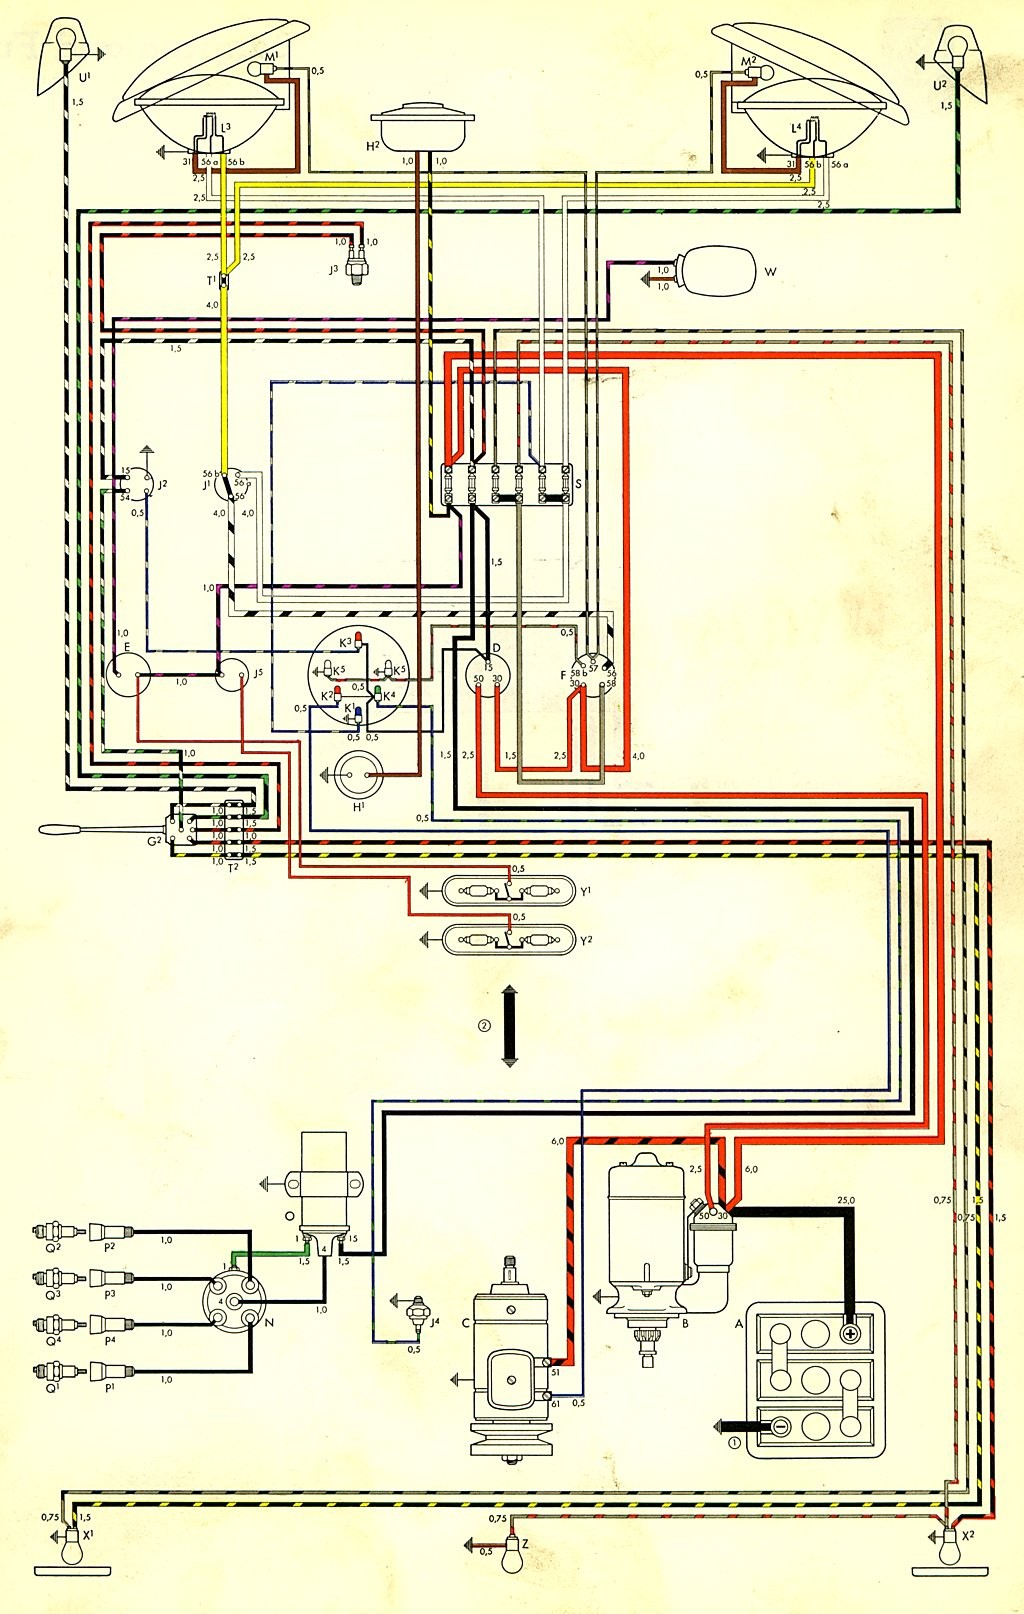 58 Vw Alternator Wiring Diagram Libraries 1974 Bug Getting Ready With U202258 Bus Harness